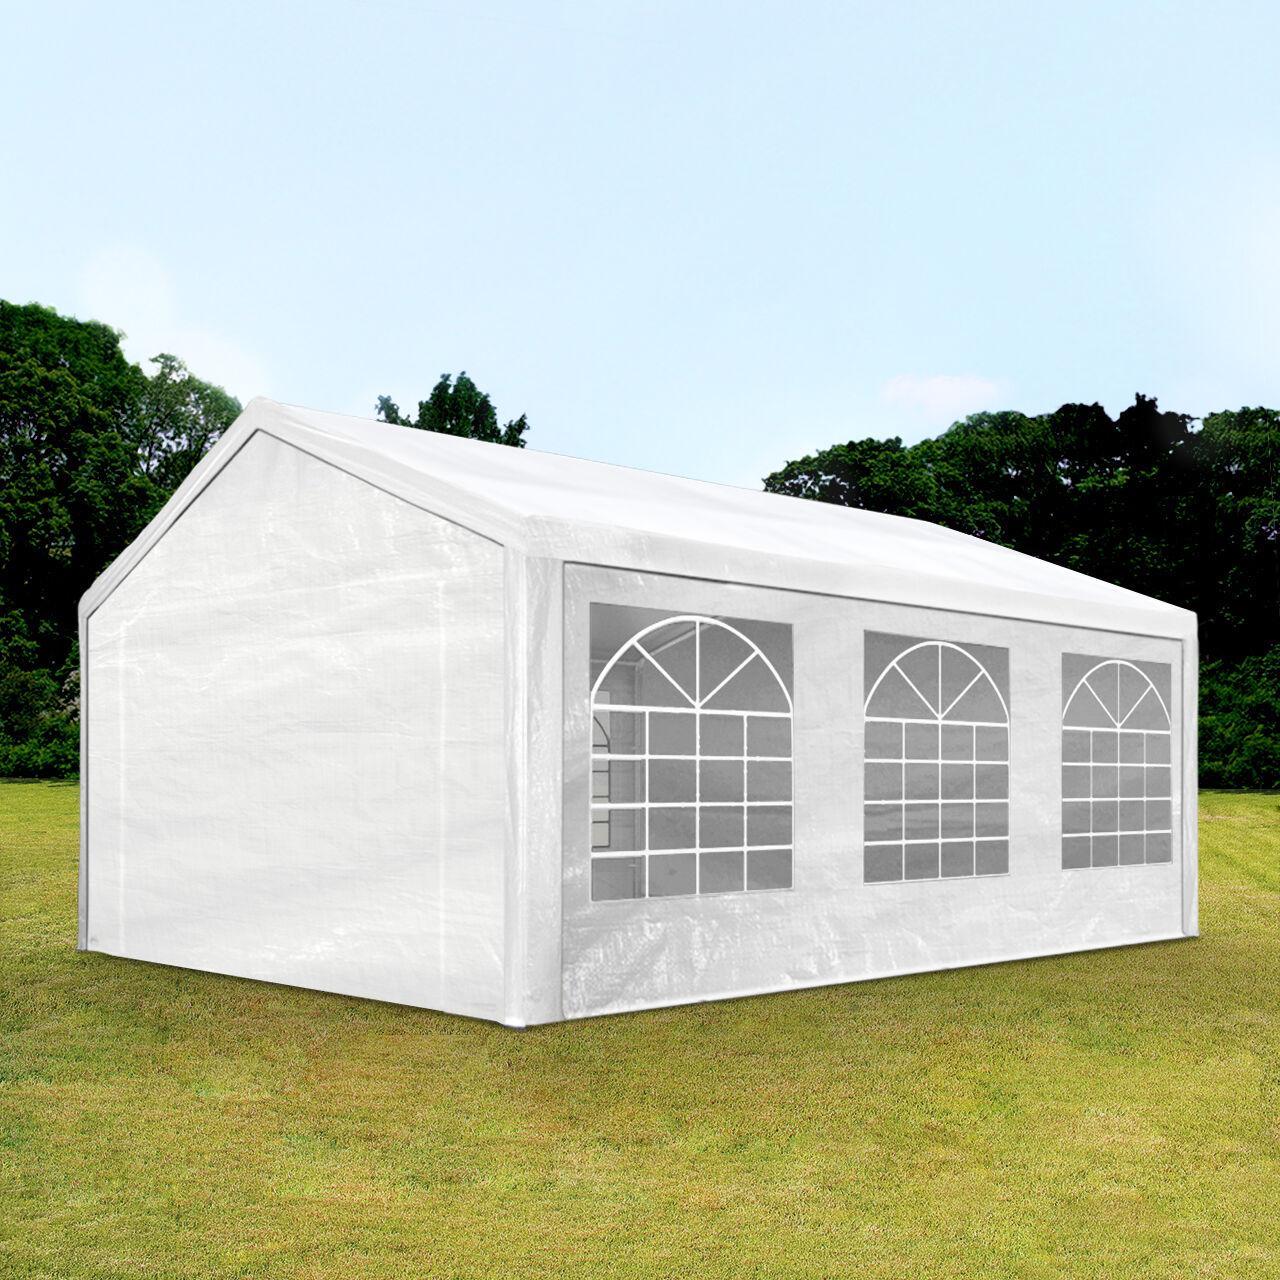 Toolport Tendone per Feste 3x6m PE 180g/m² bianco impermeabile